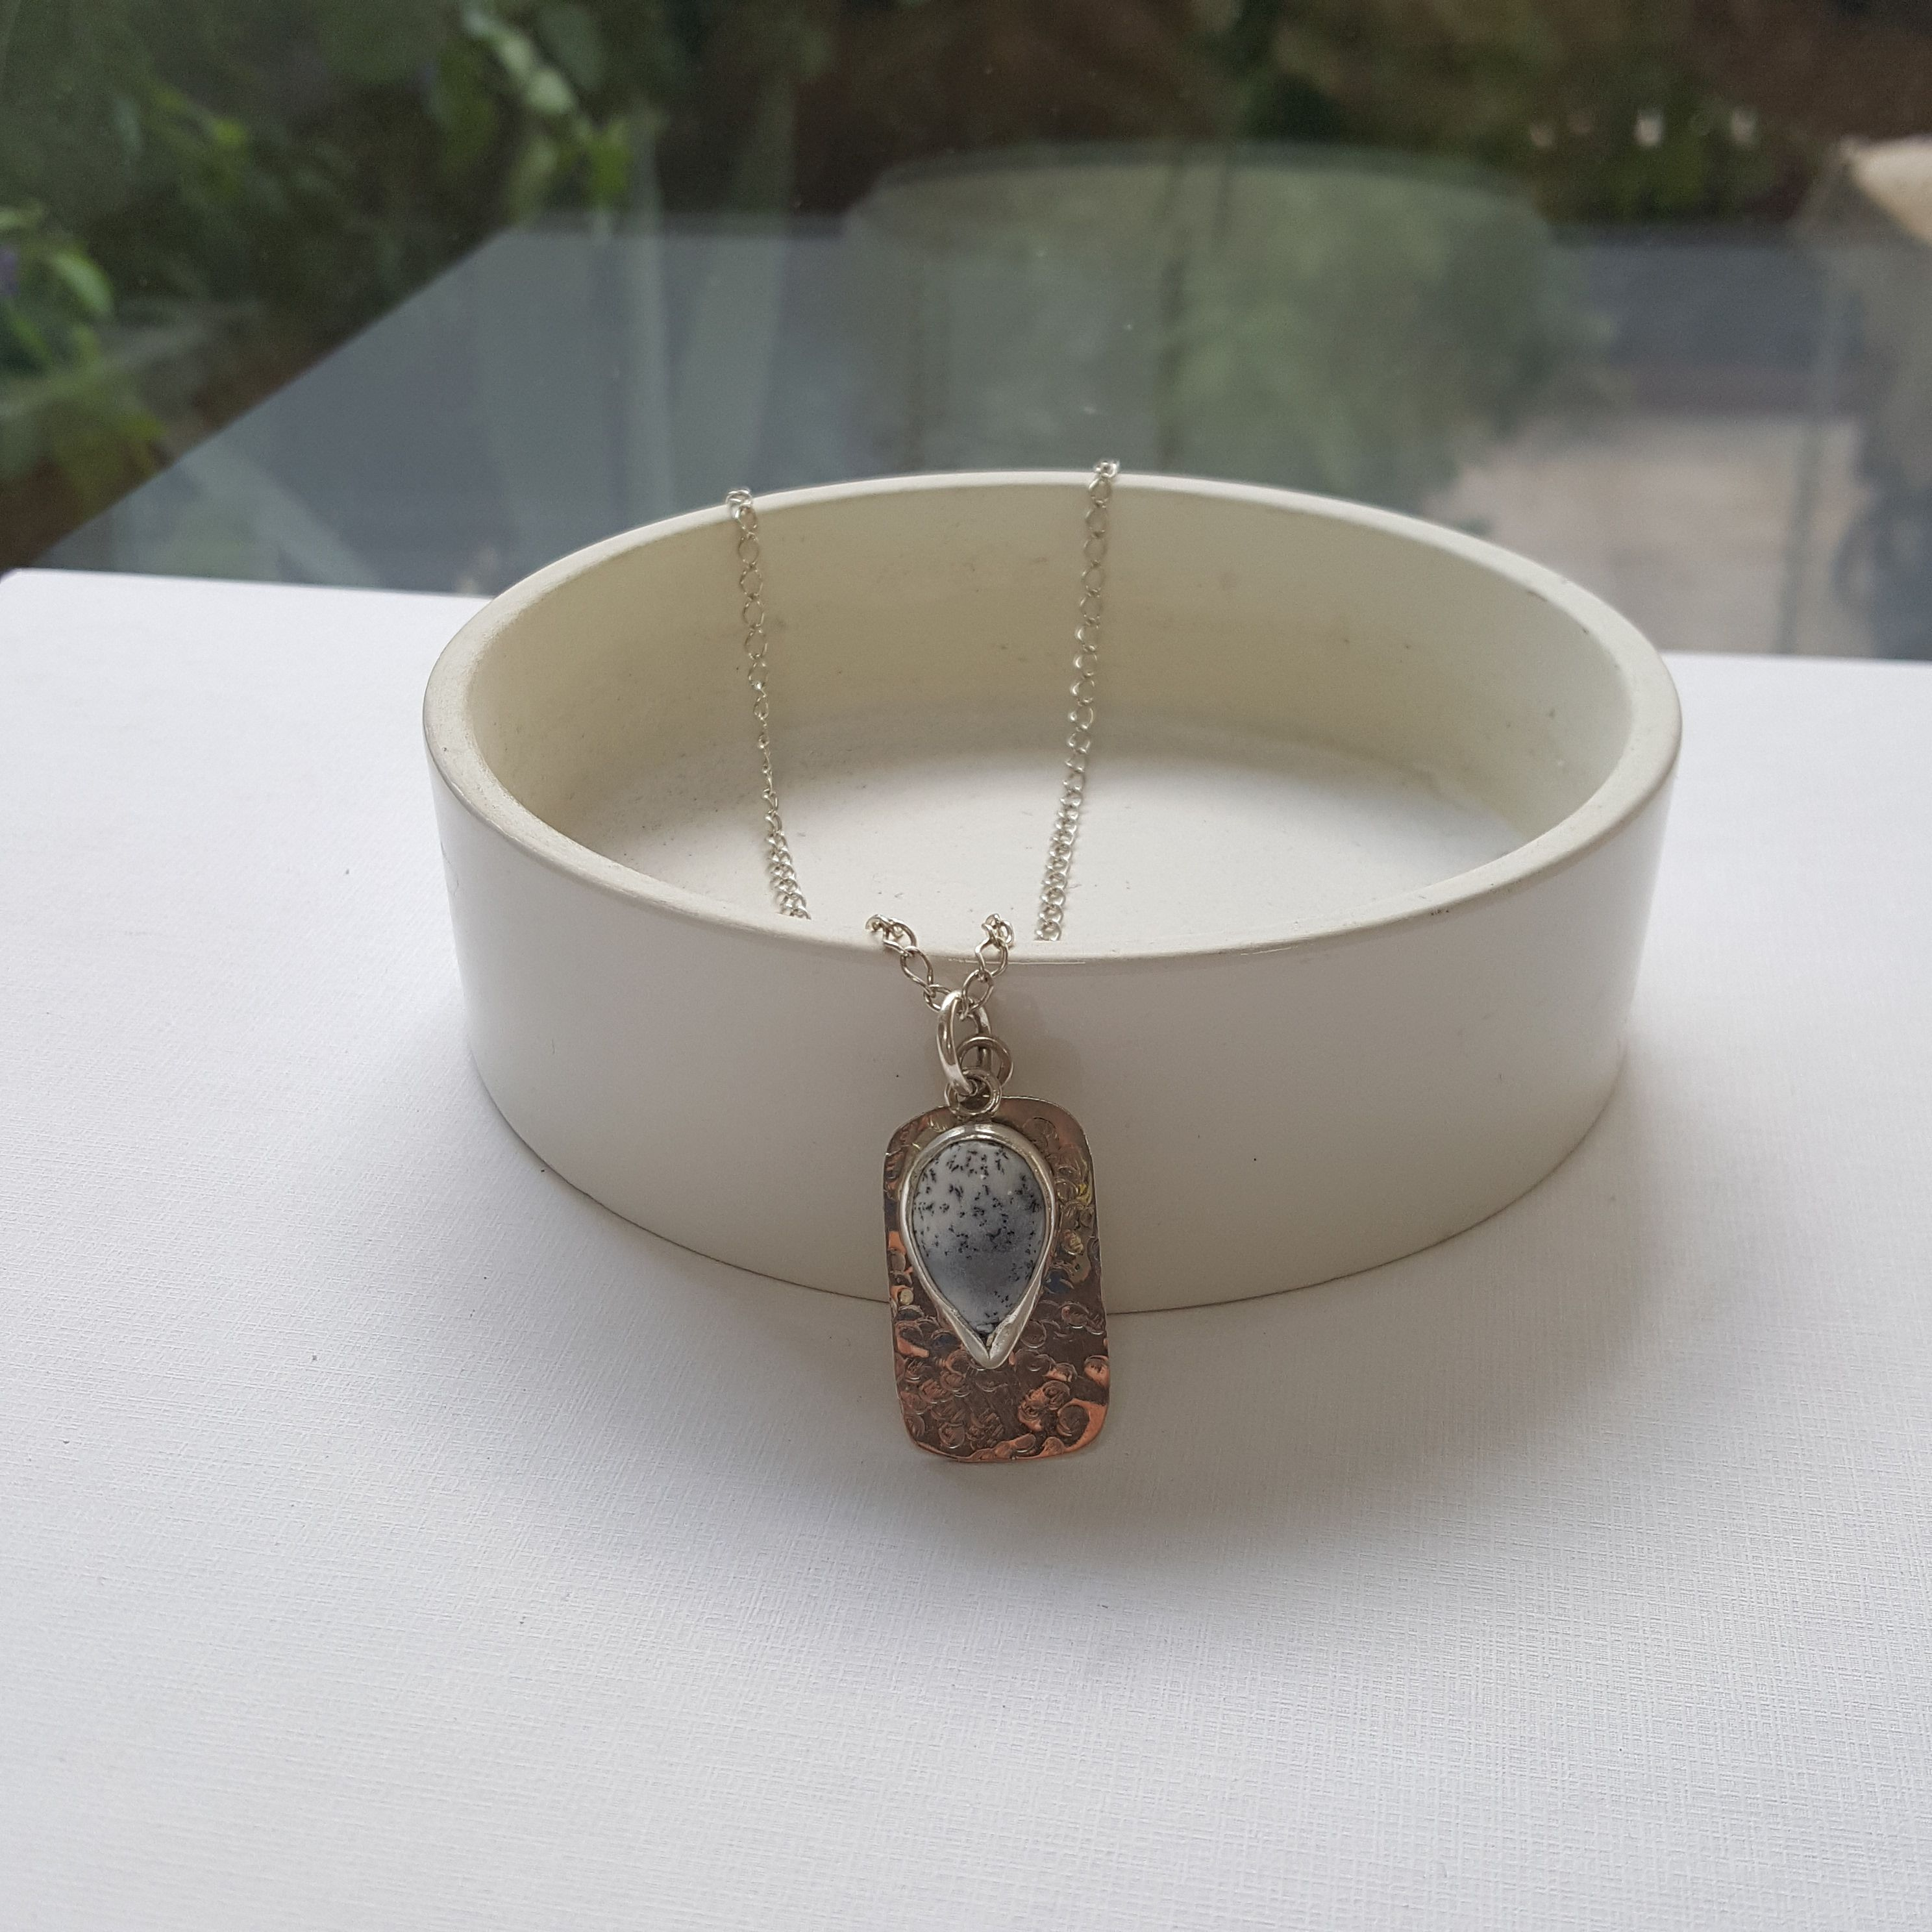 opal stone modern style jewelry Designer Atlyemiz Canmz studio